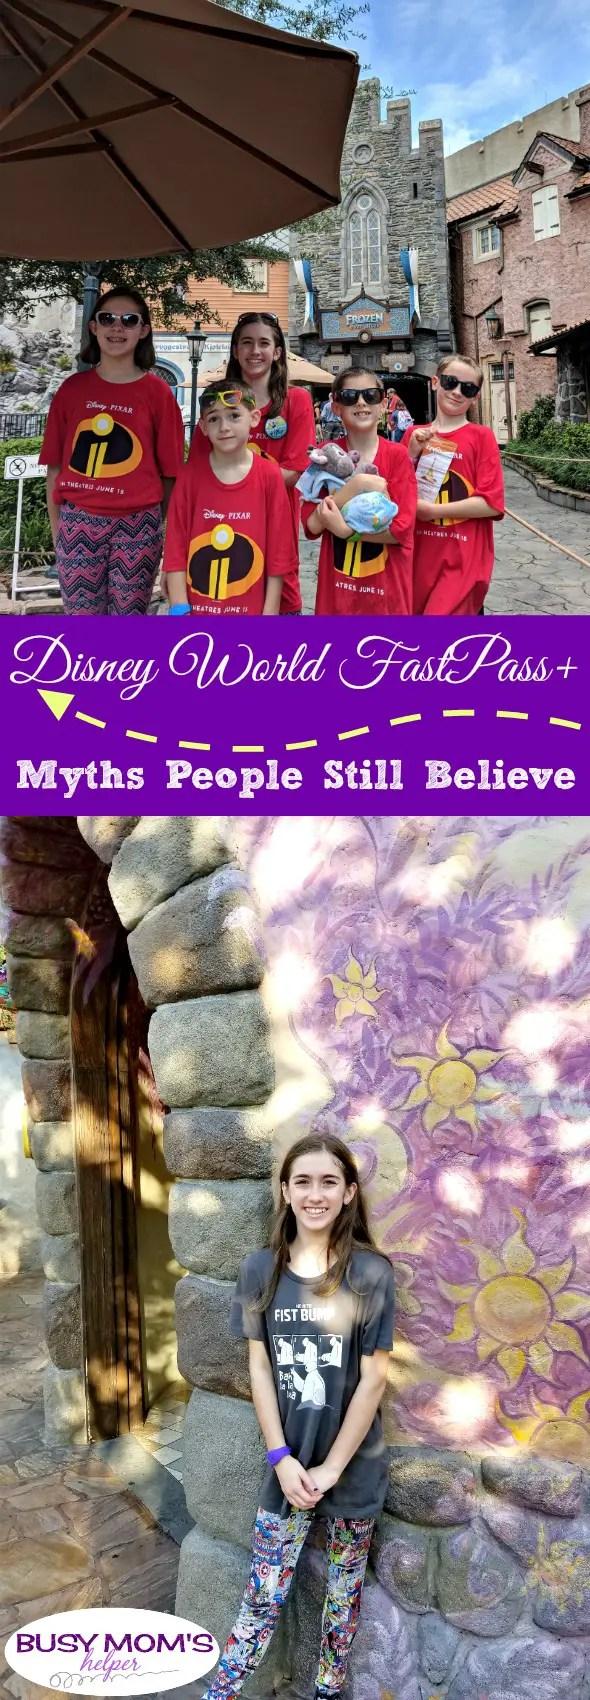 Disney World FastPass+ Myths People Still Believe #waltdisneyworld #disneyparks #travel #familytravel #disneytravel #disneytrip #fastpass